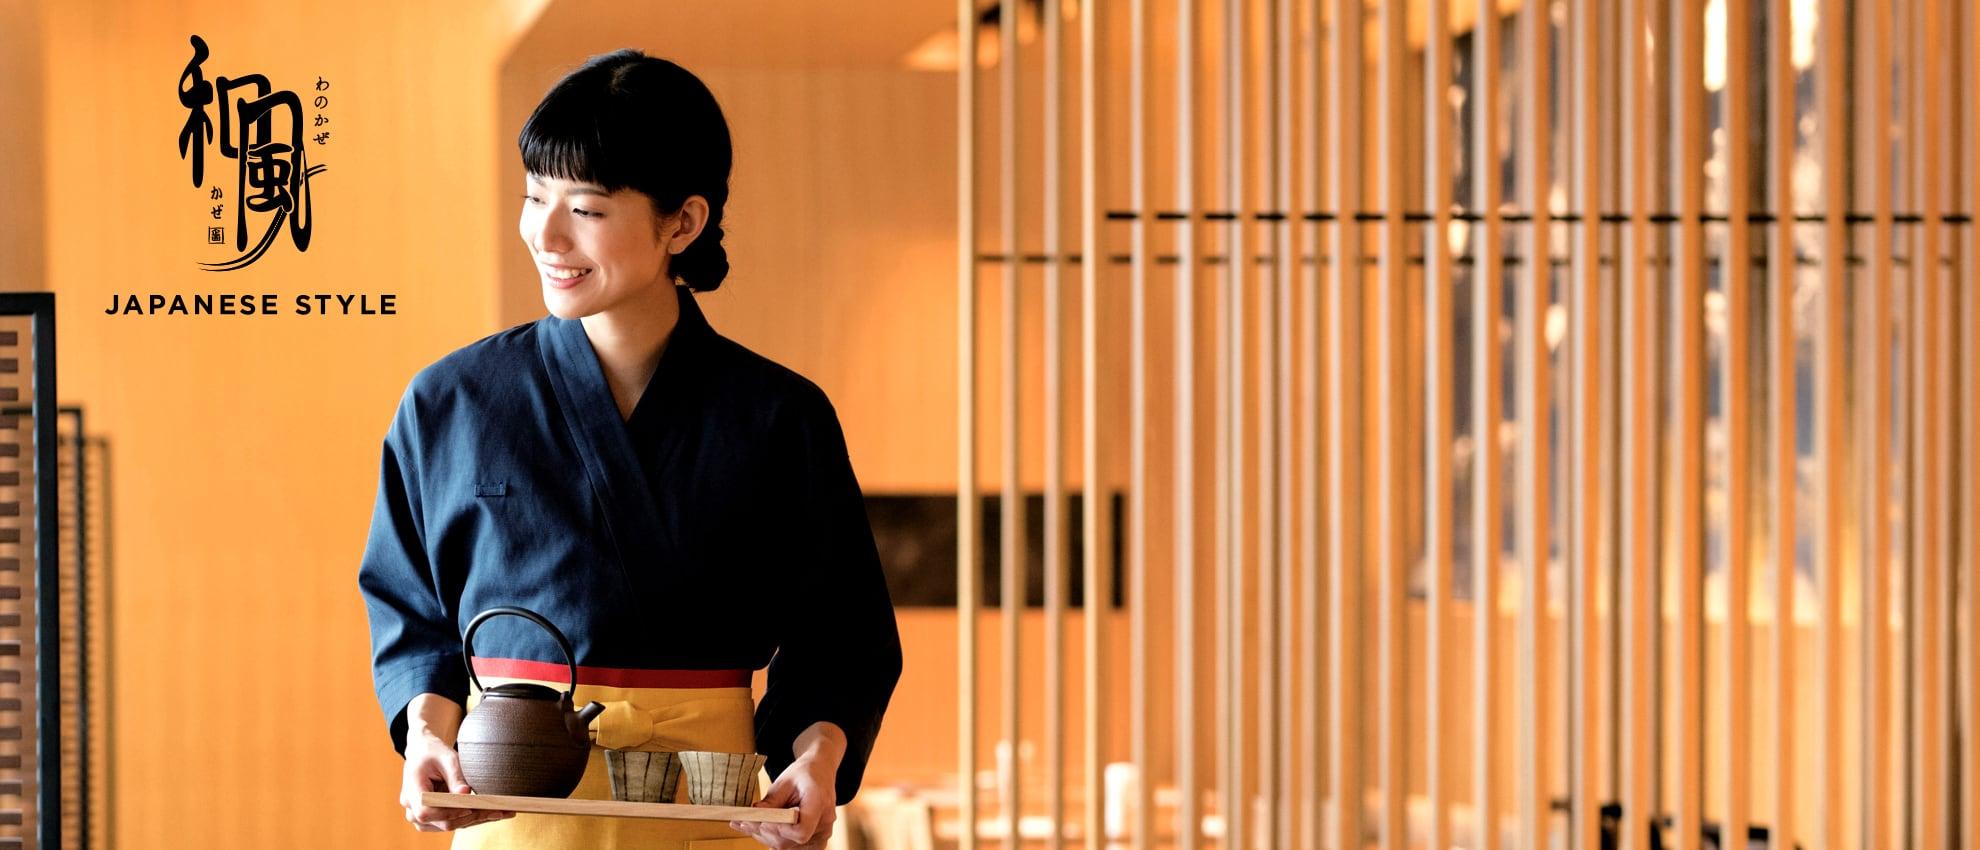 Wa-No-Kaze - Japanese Style Costumes |Boston Group - Japan